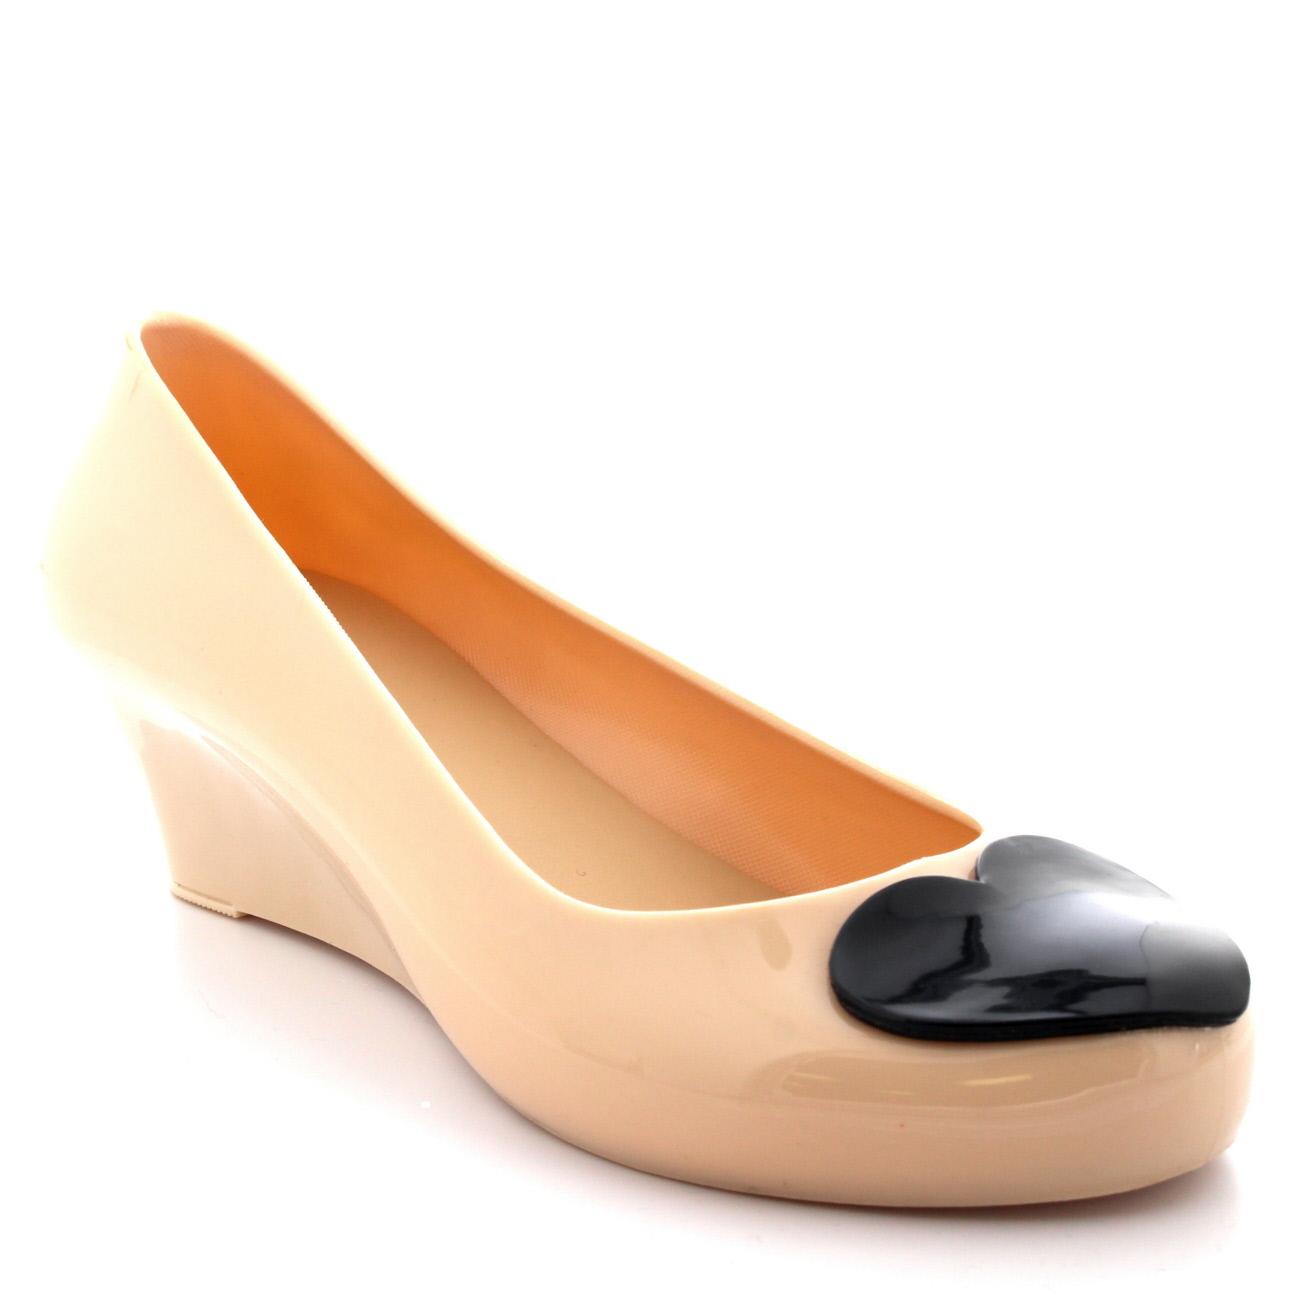 Details about Womens Love Heart Slip On Summer Jelly Wedge Heel Ballet Ballerina Shoes UK 3 9